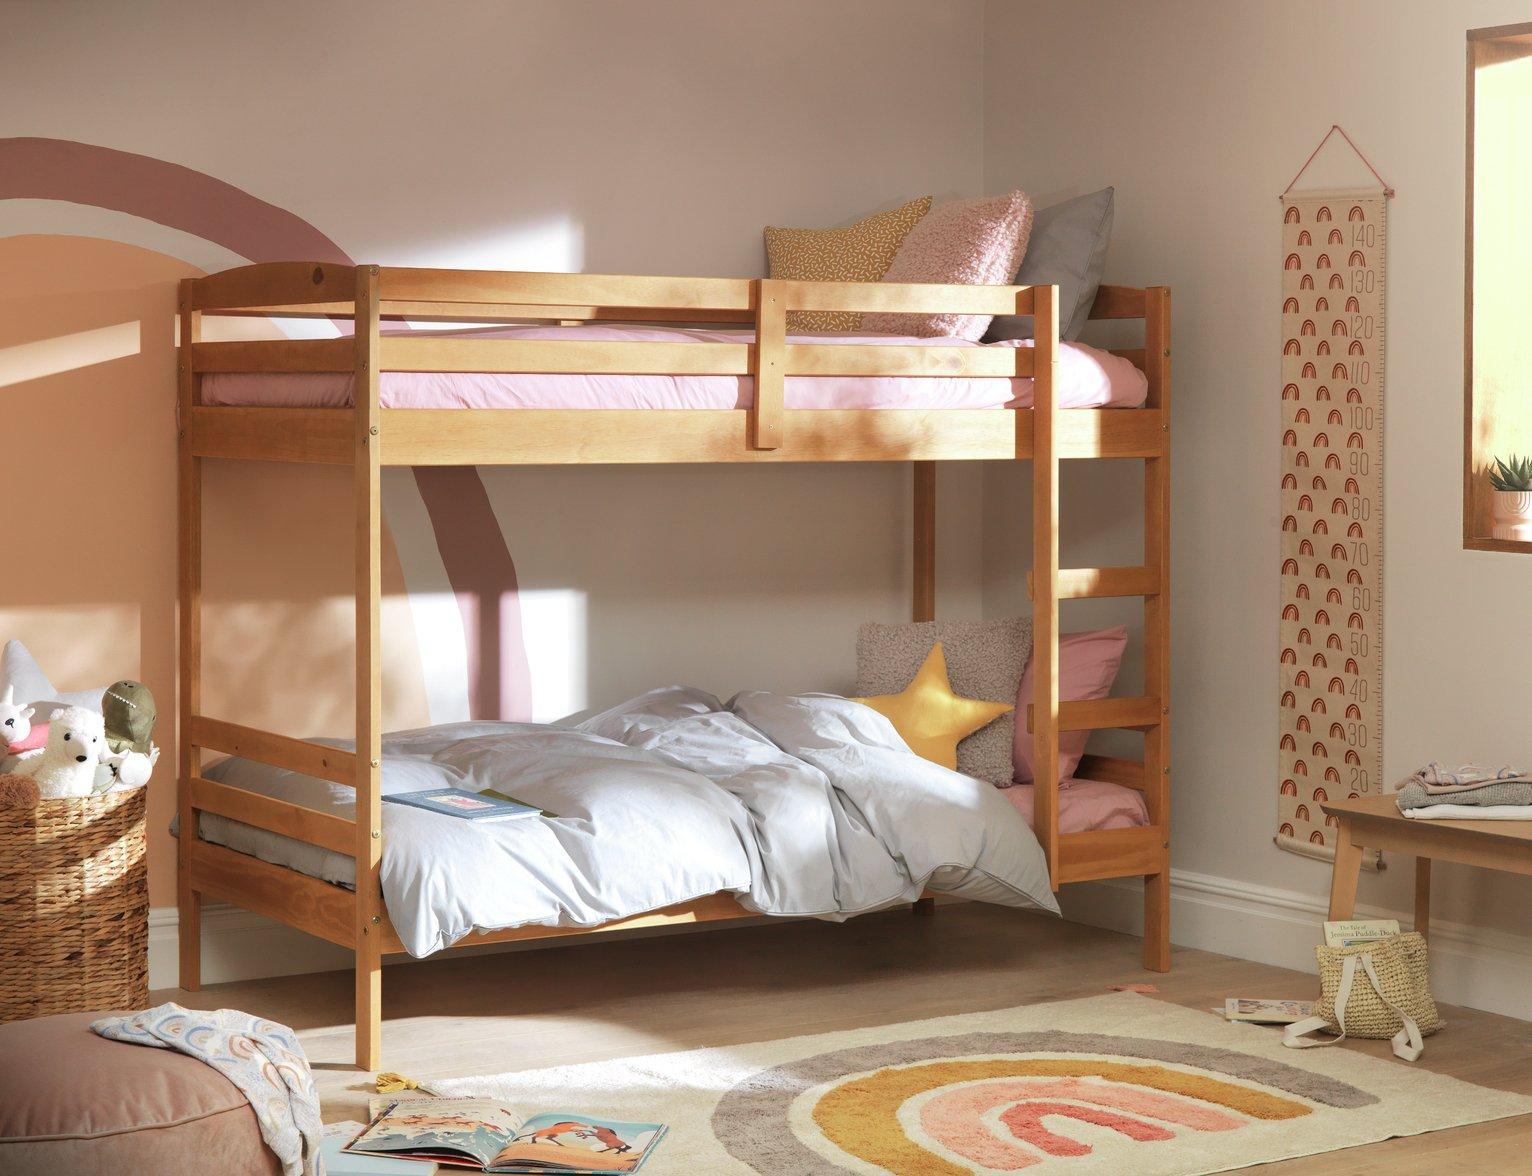 Argos Home Josie Single Bunk Bed Frame - Pine